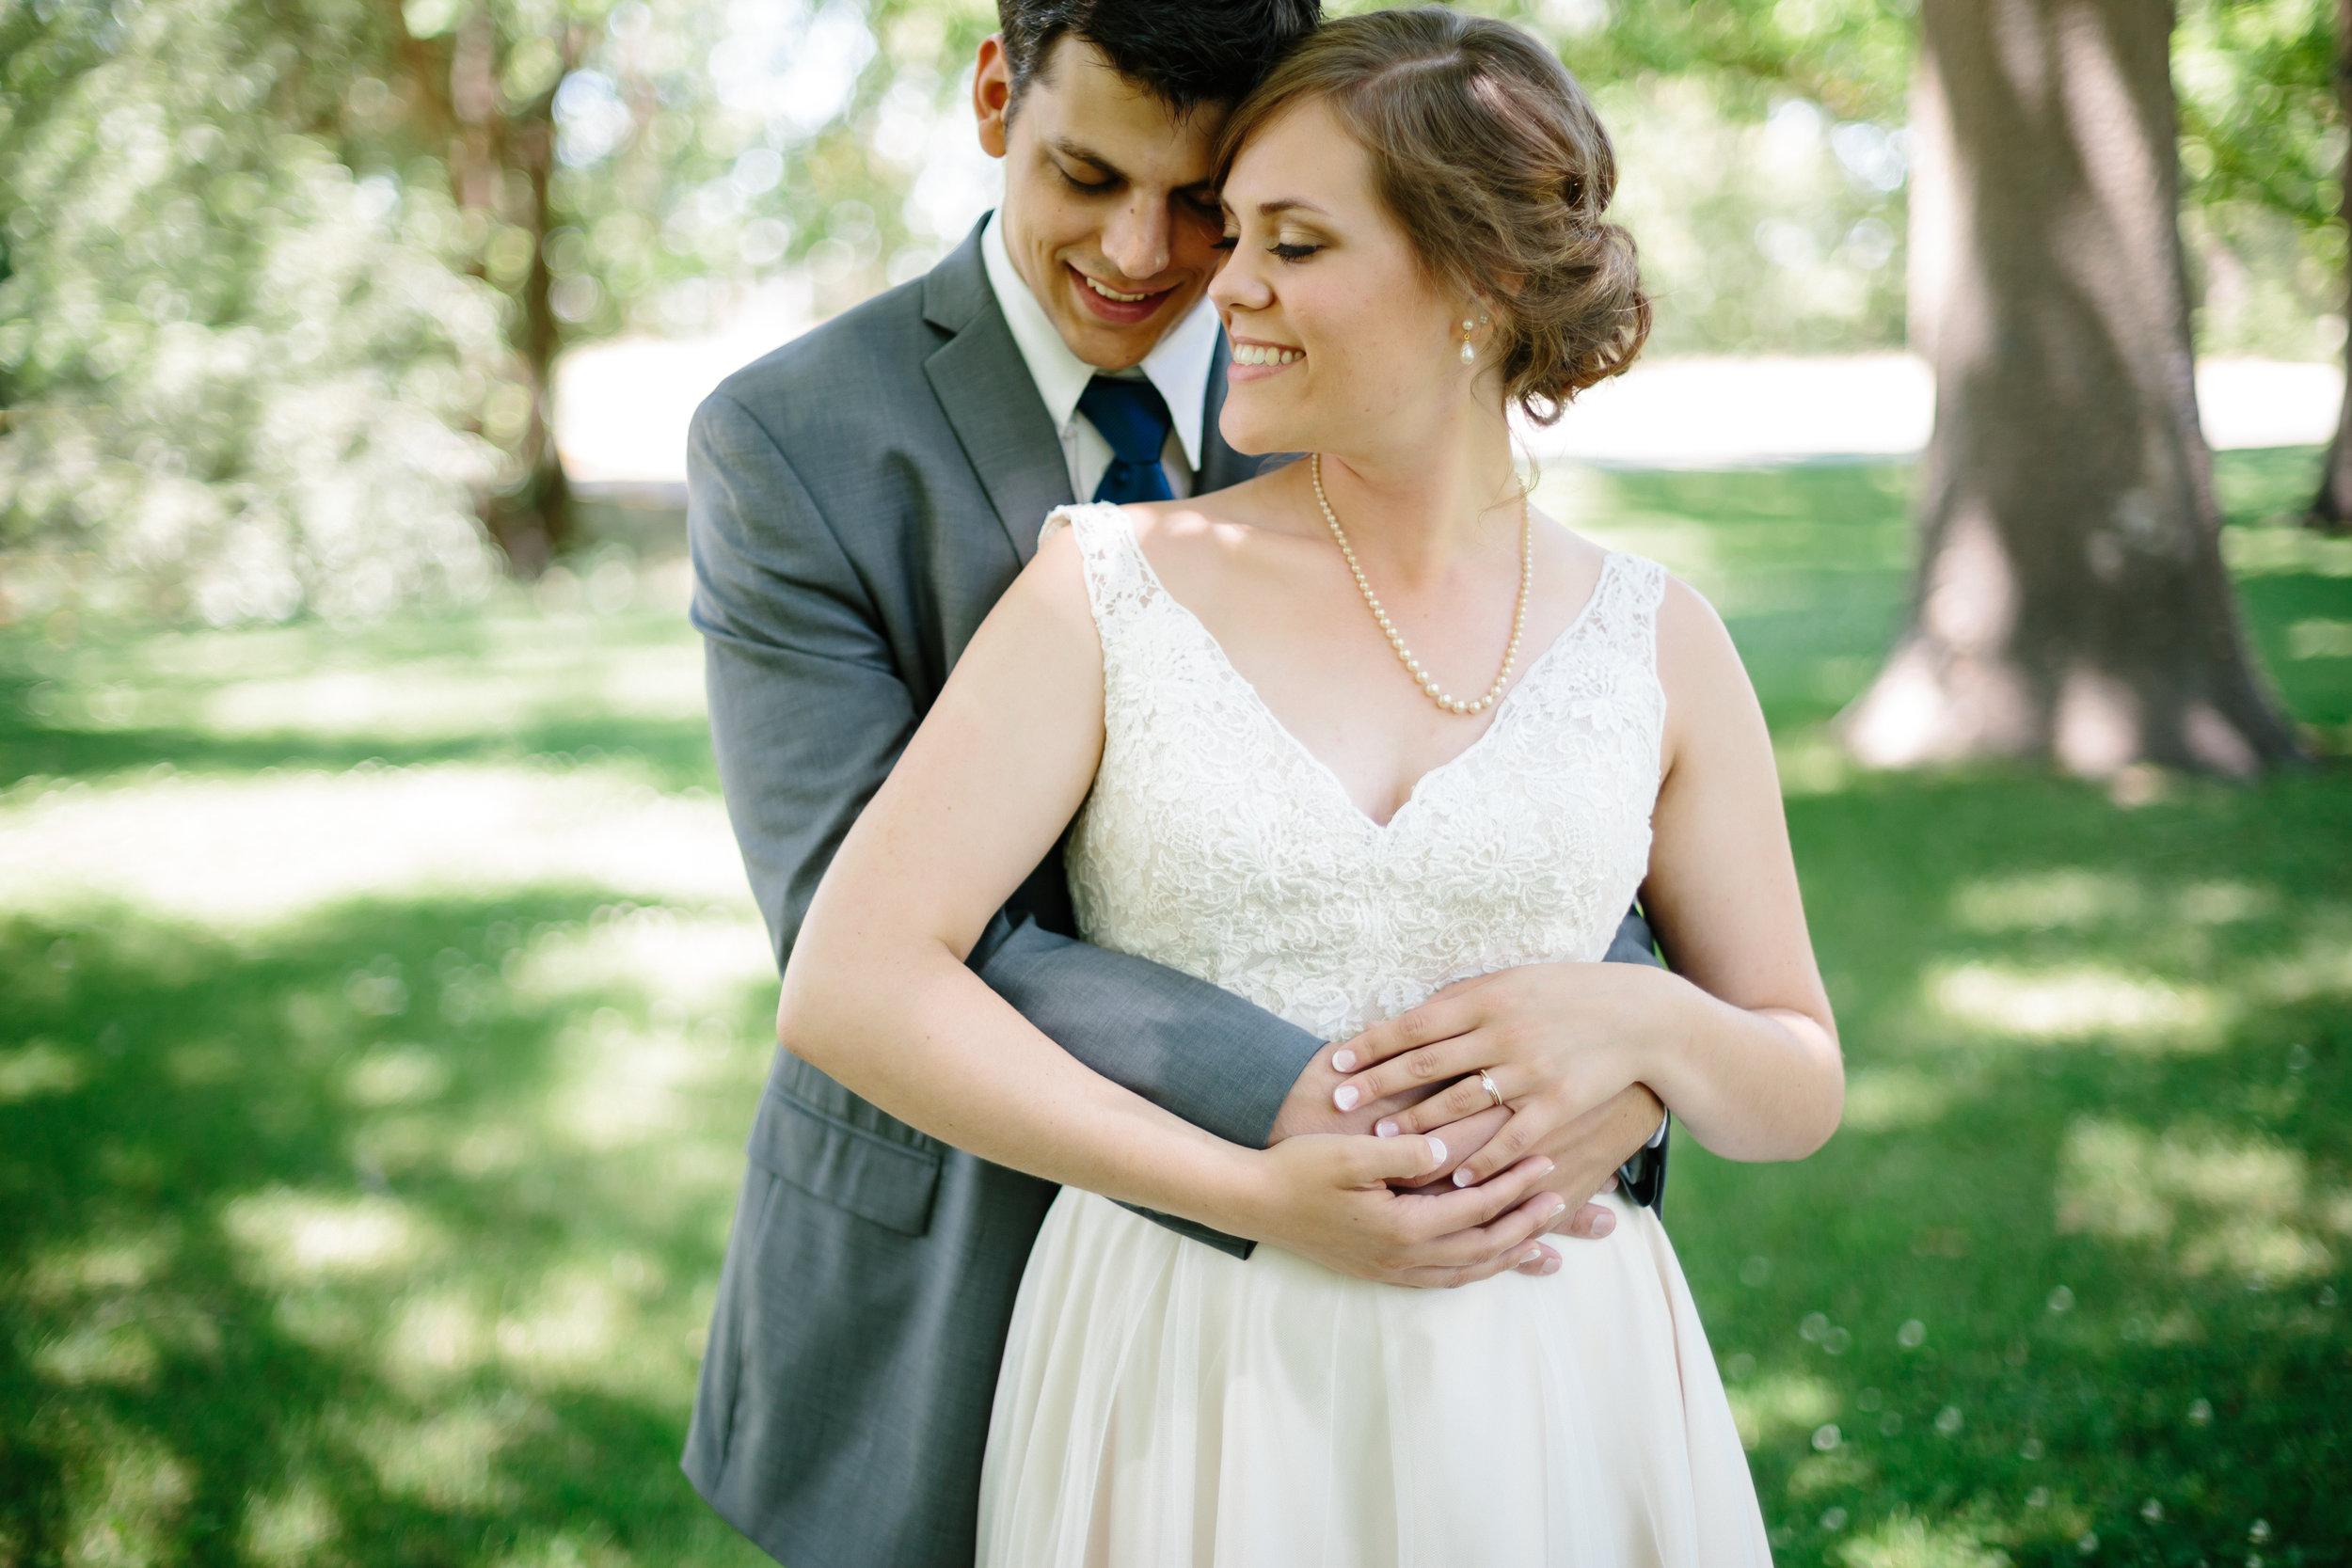 Jordan & Shantel Married - Idaho - Corrie Mick Photography-110.jpg